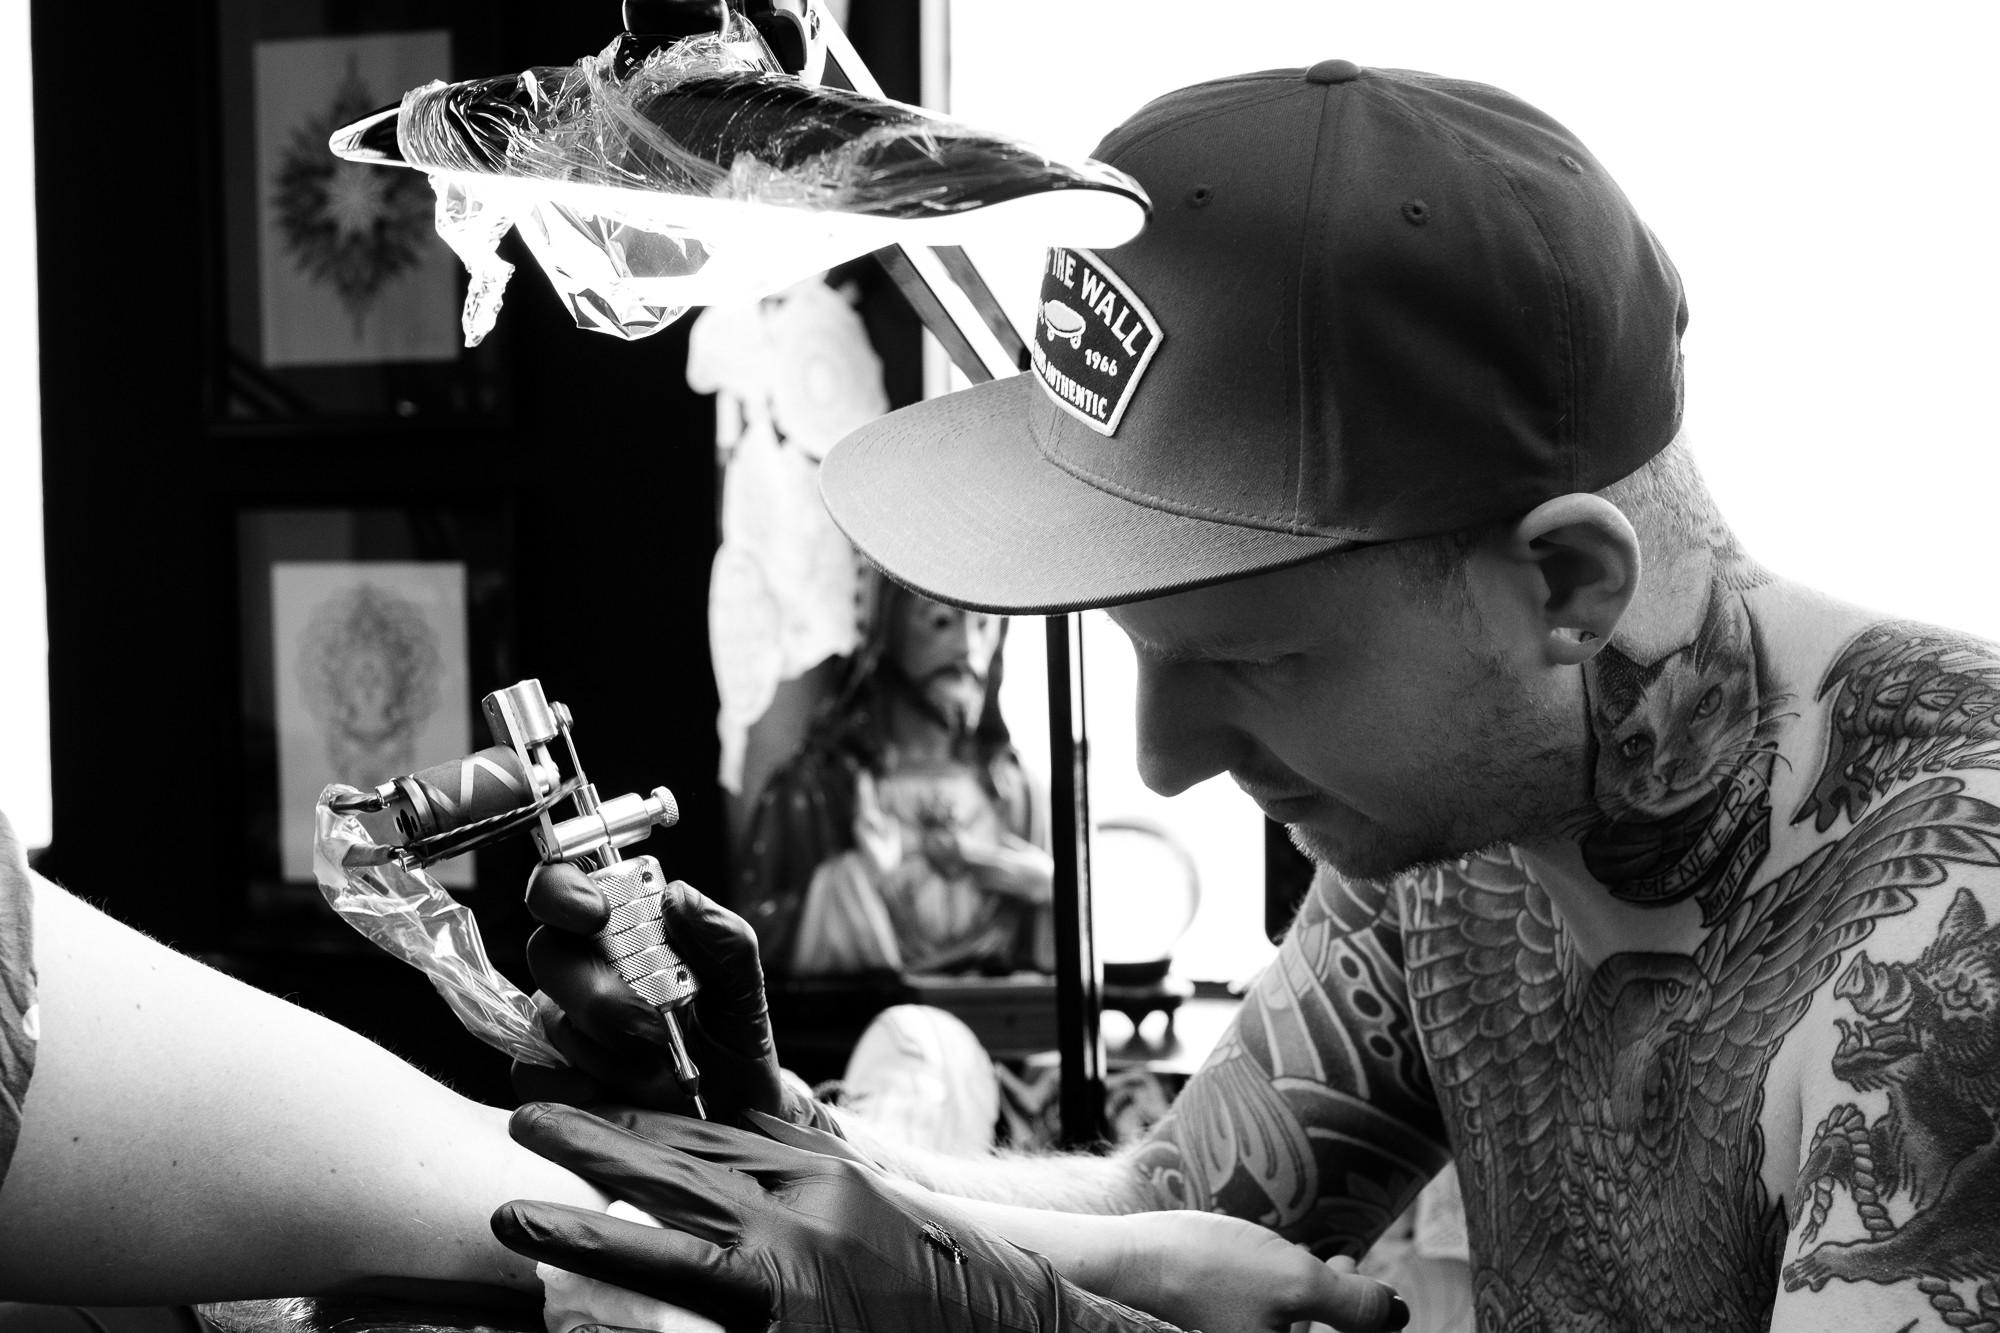 Bas van den Braak, Tattoo artist